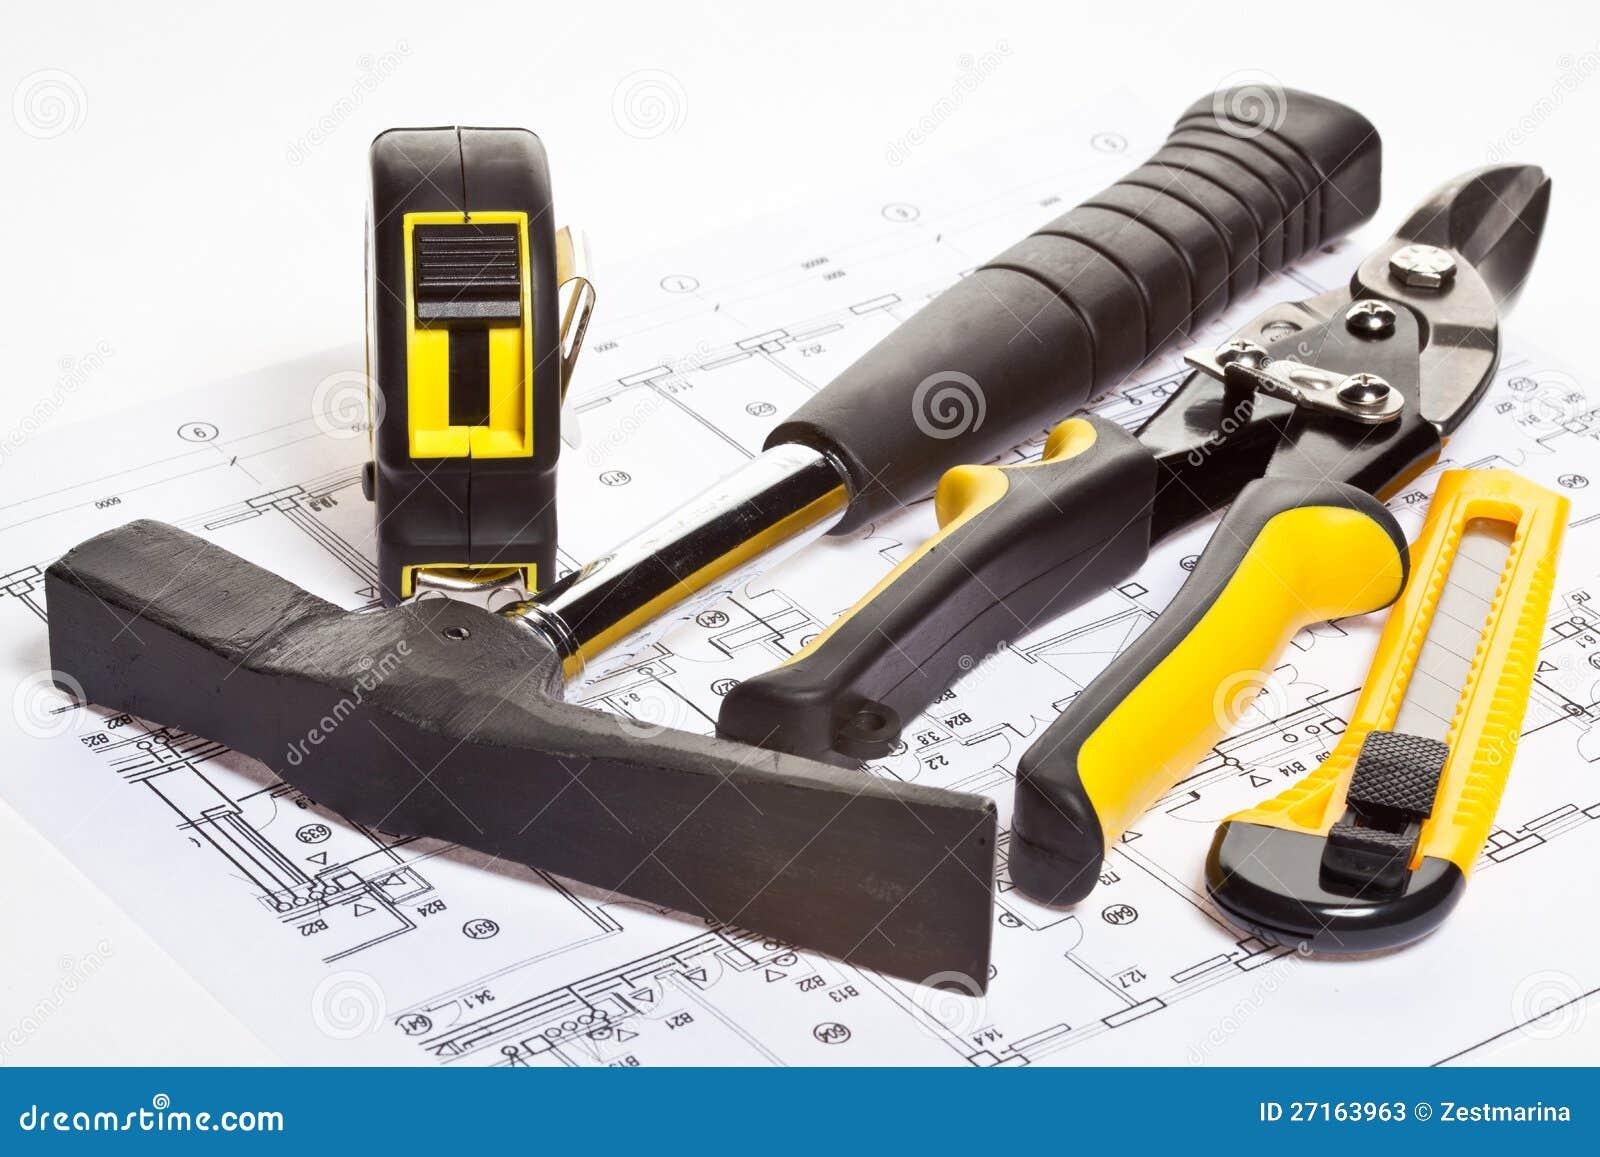 construction tools and blueprint stock photos image 27163963